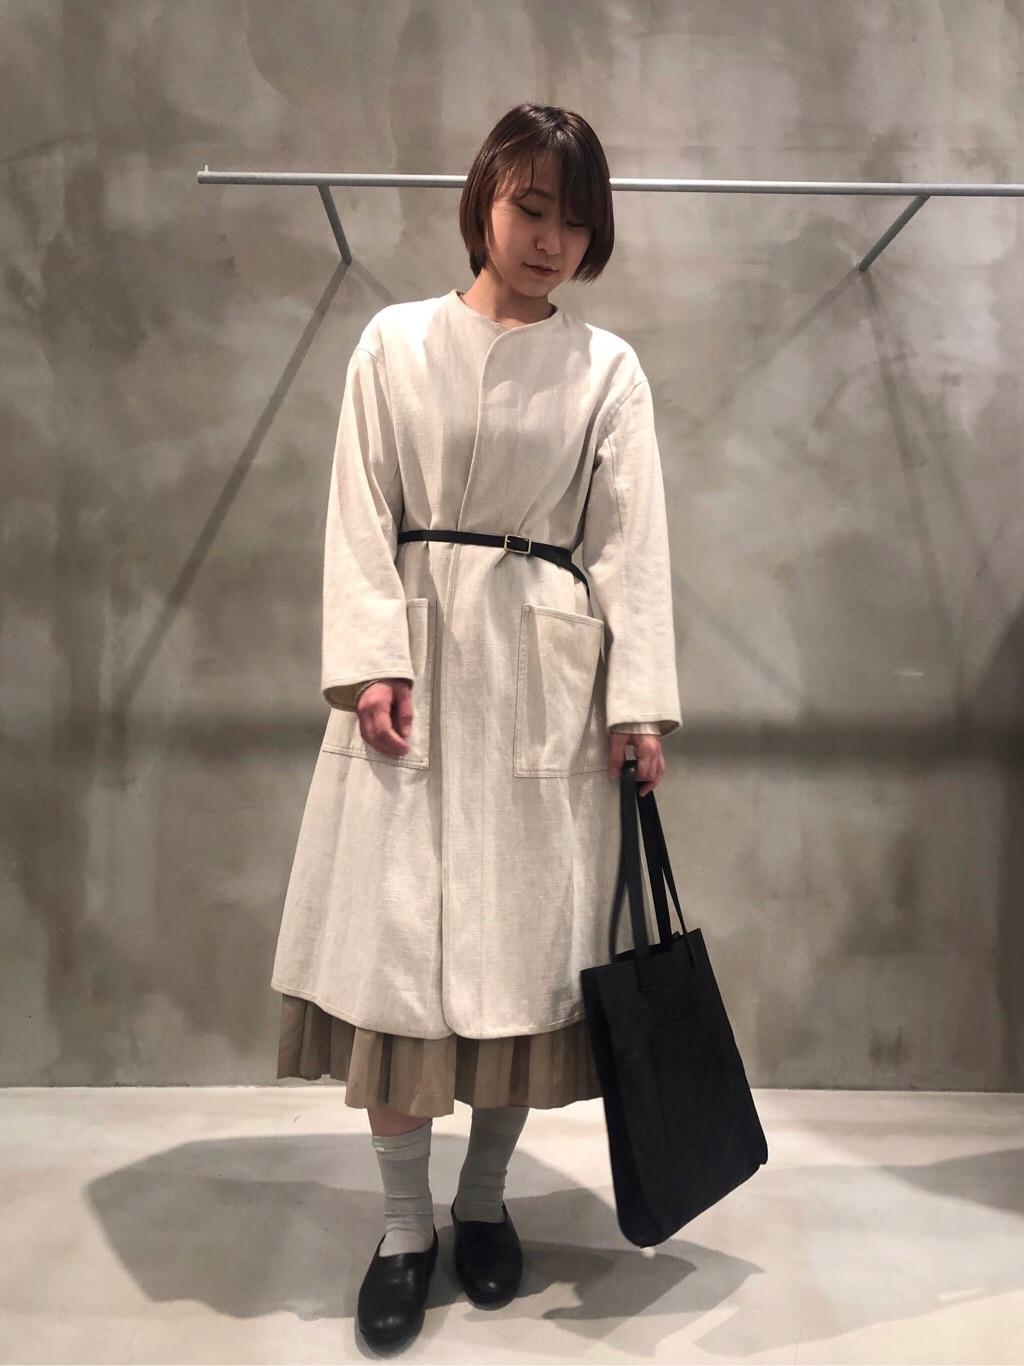 bulle de savon 渋谷スクランブルスクエア 身長:159cm 2020.03.05